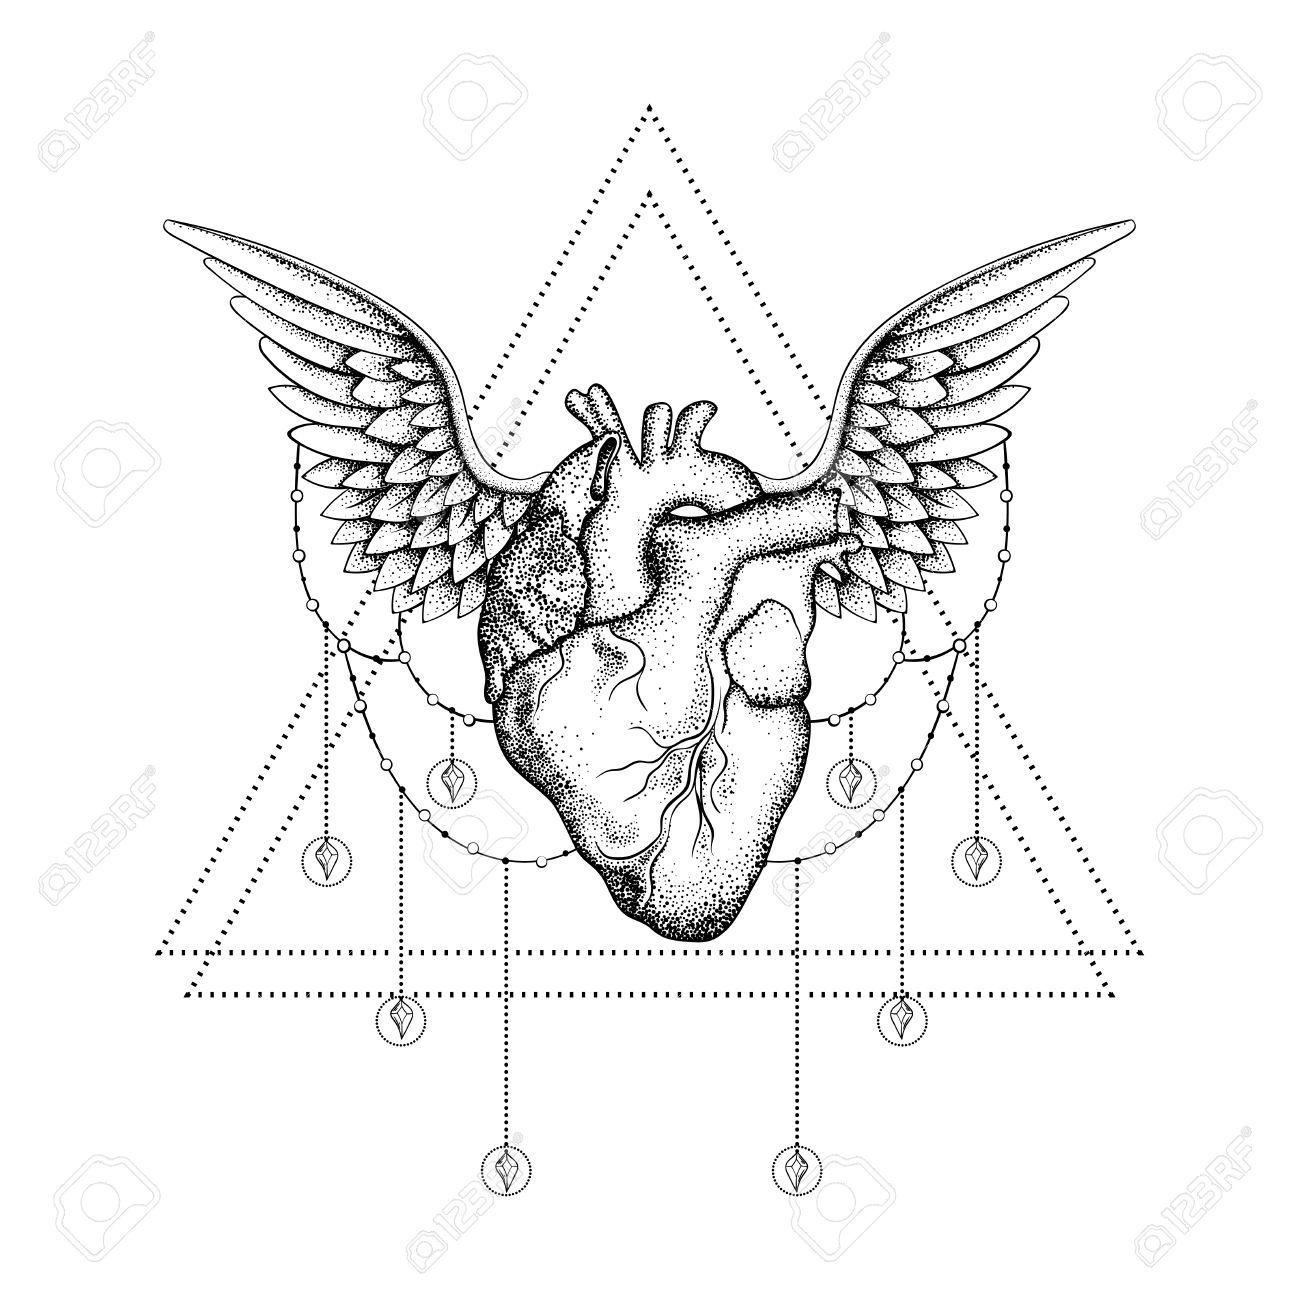 1299x1300 Hand Drawn Boho Tattoo. Blackwork Human Heart With Wings